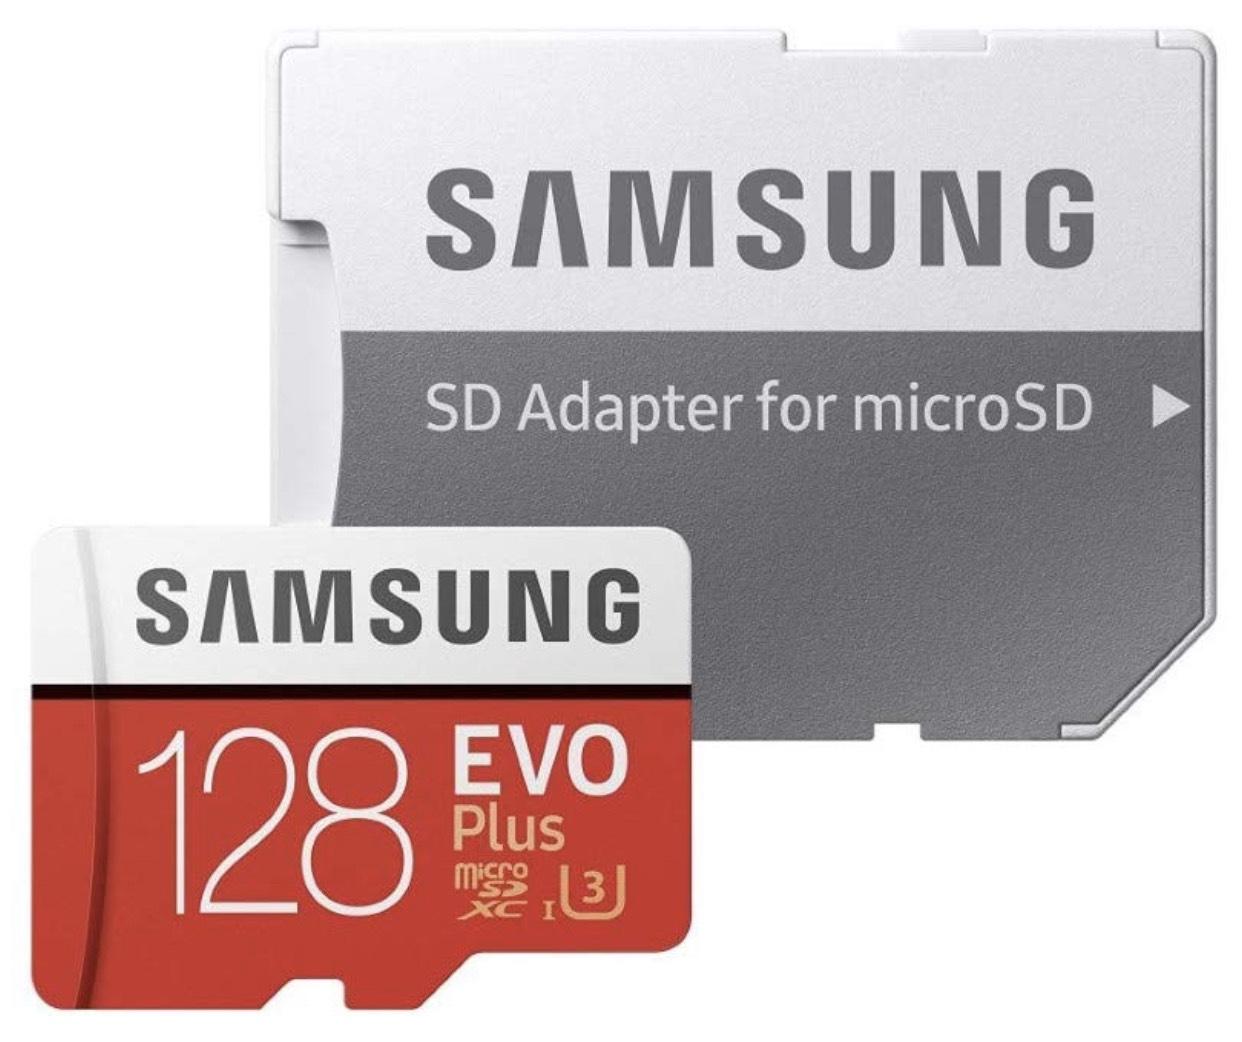 Samsung EVO Plus microSDHC 128 GB, 100 MB/s, UHS-I U3 (inkl. SD Adapter) für 19,16€